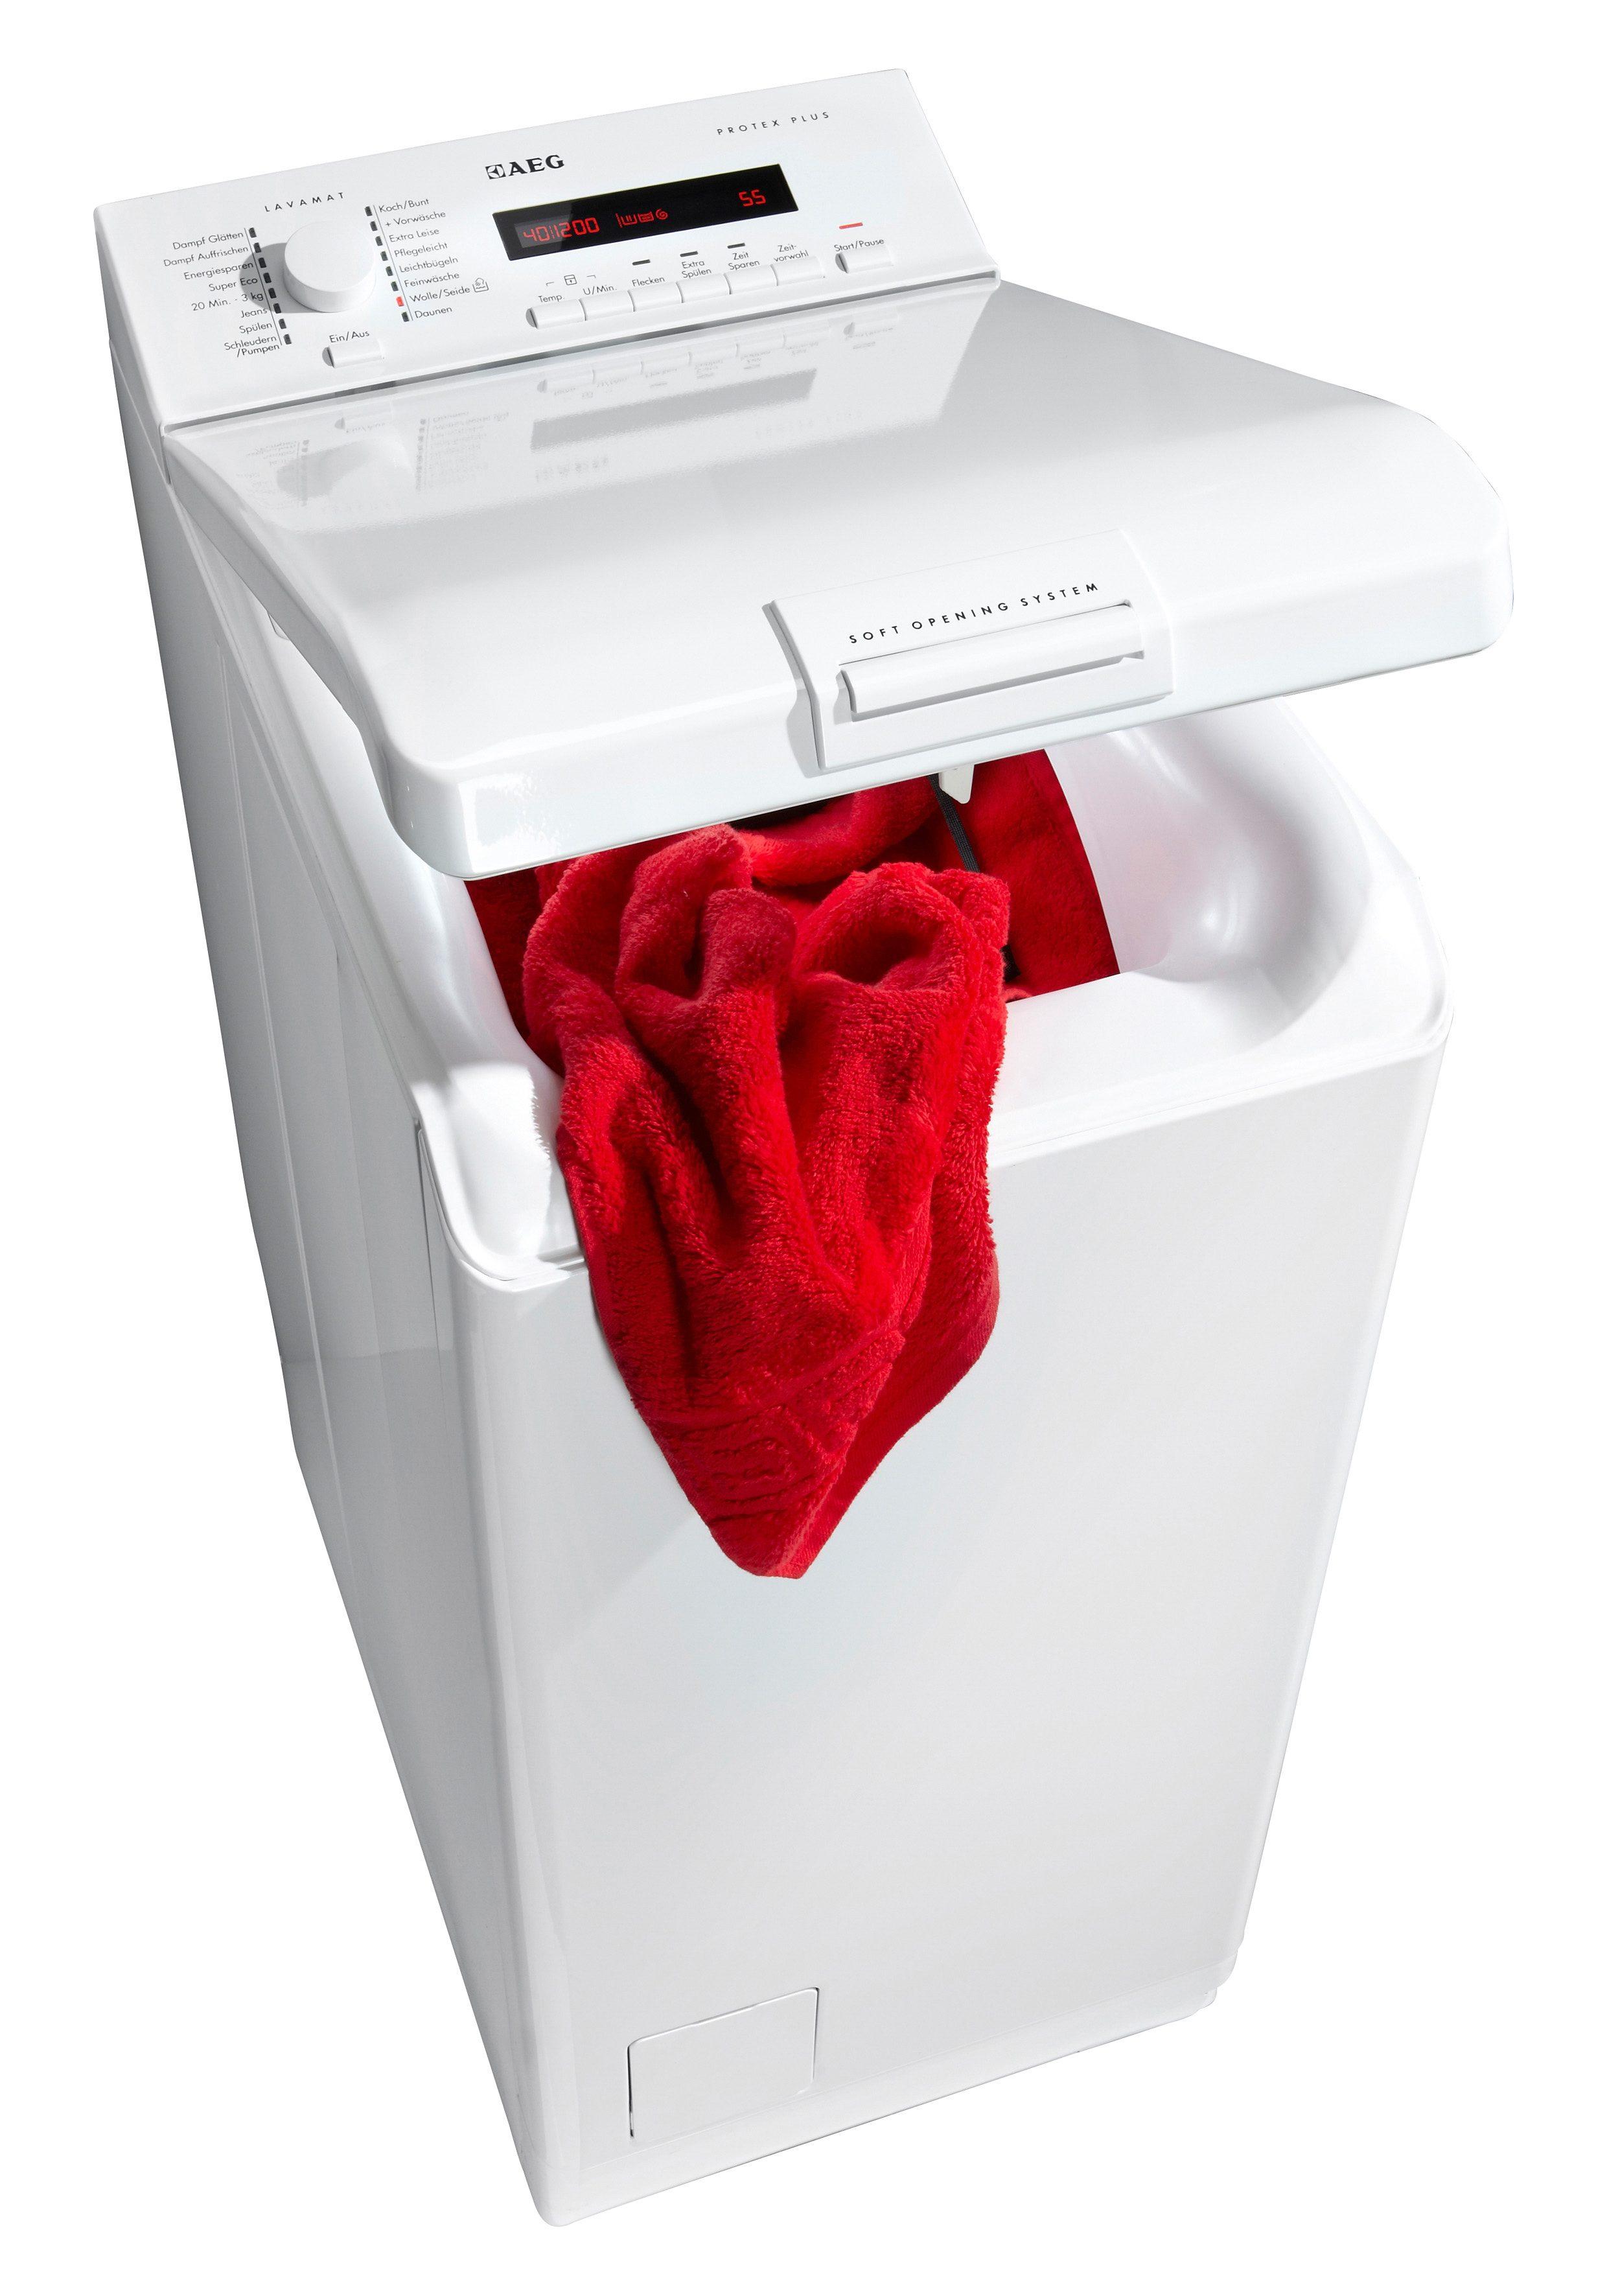 AEG Waschmaschine Toplader L76265TL3, A+++, 6 kg, 1200 U/Min